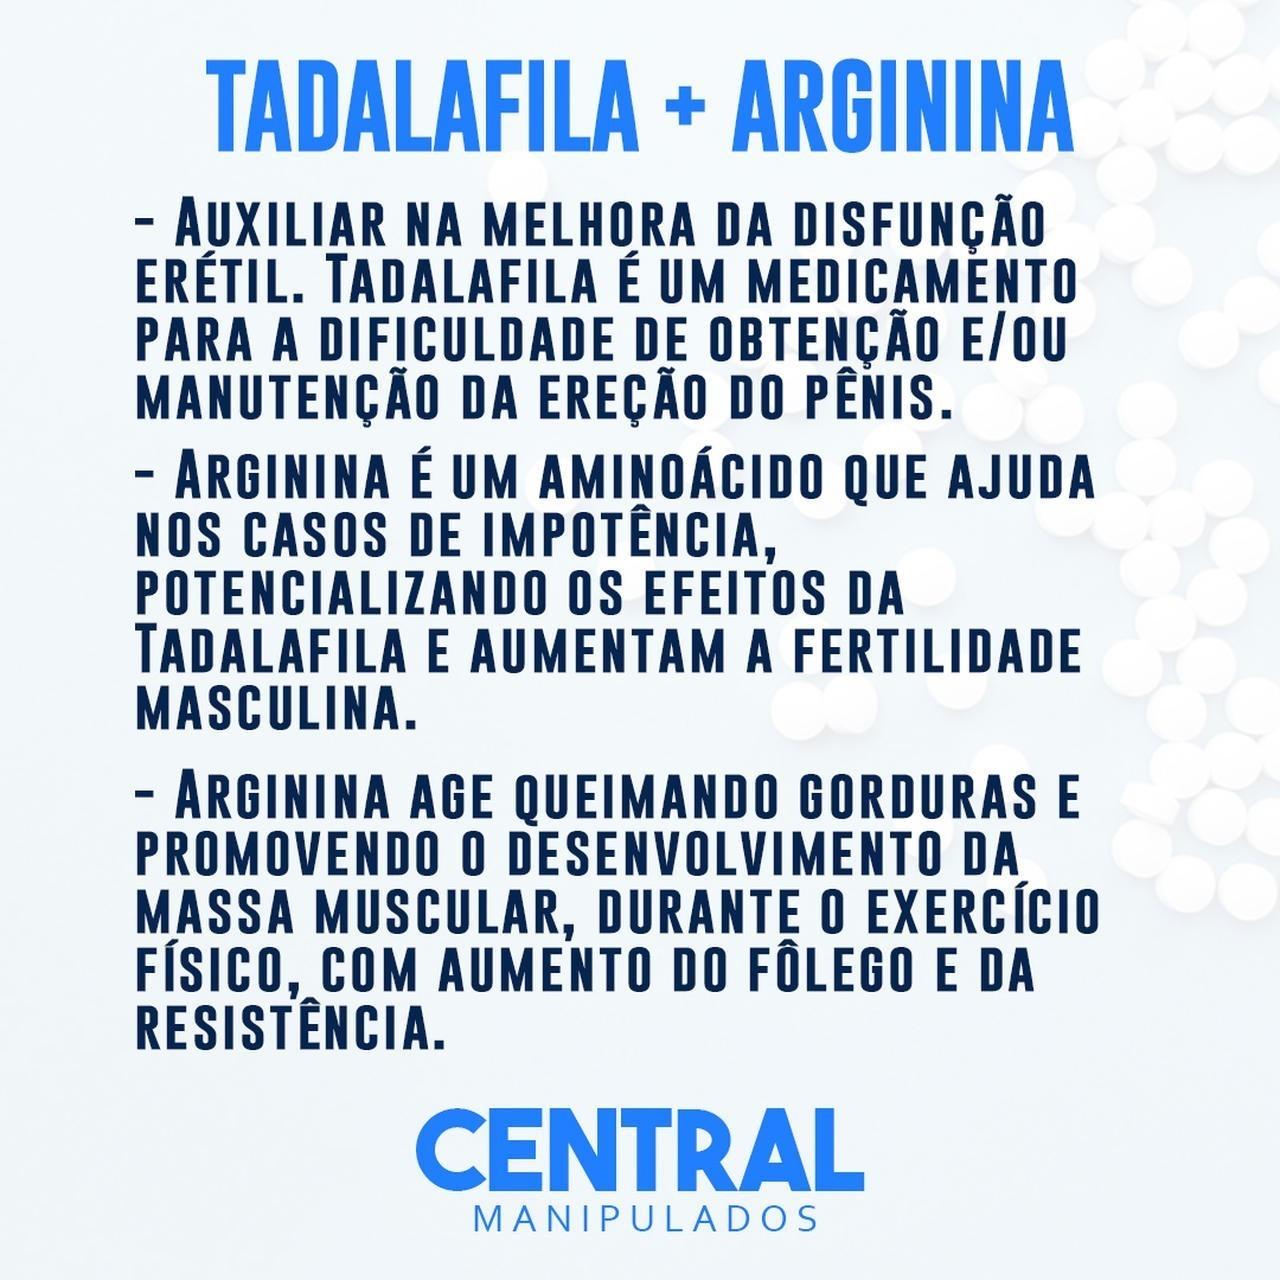 Tadalafila 20mg 120 Cápsulas + Arginina 500mg 120 Cápsulas - Vasodilatador